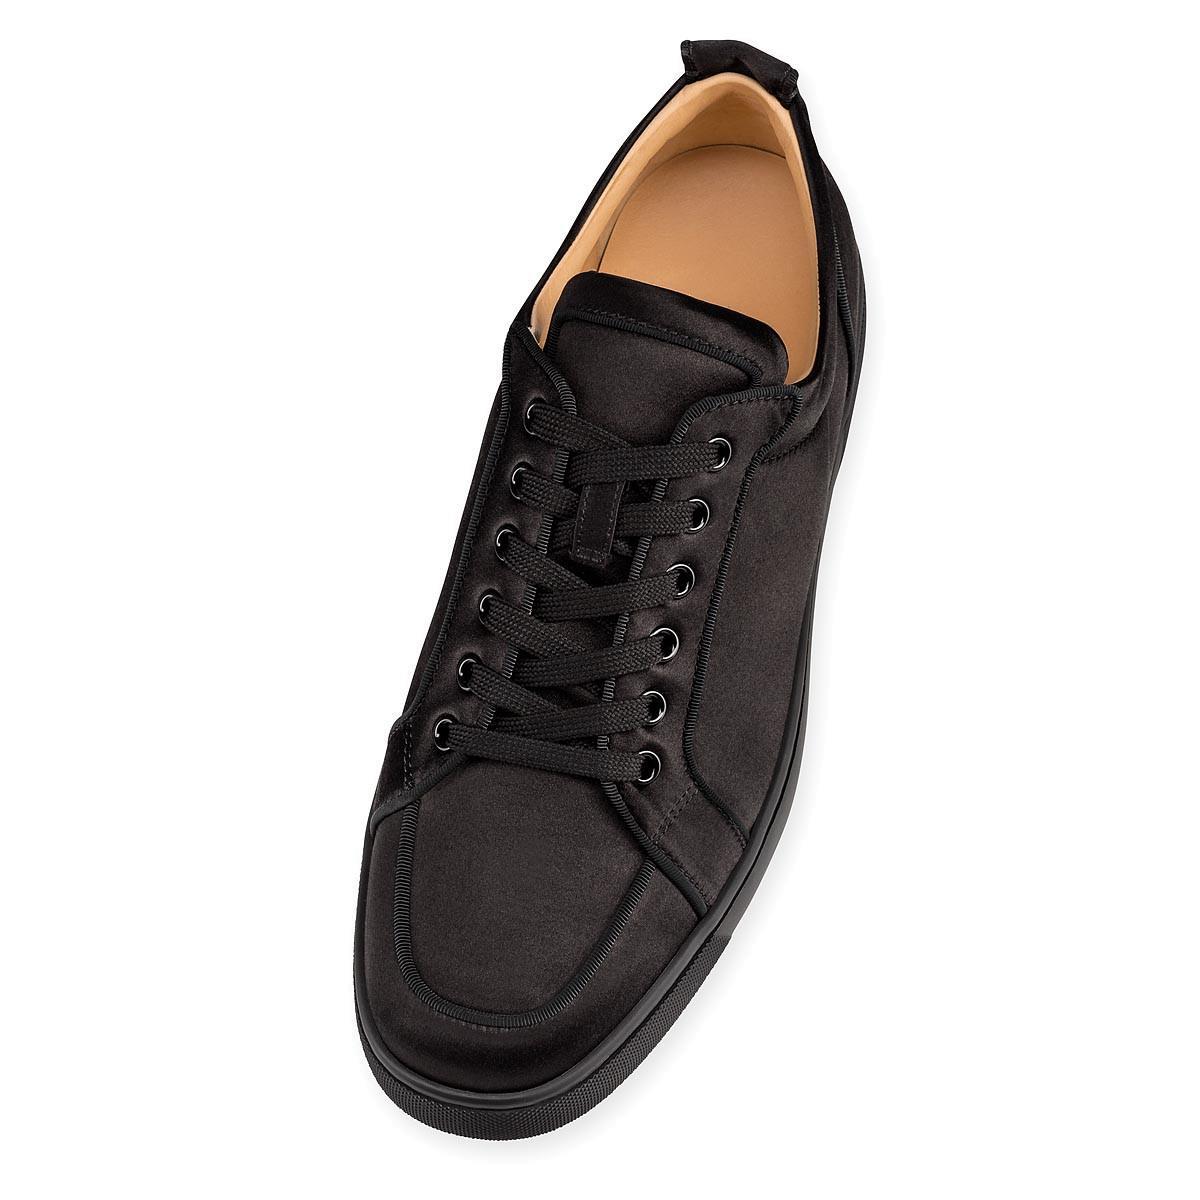 1262177797d Christian Louboutin Rantulow Orlato Men s Flat In Black